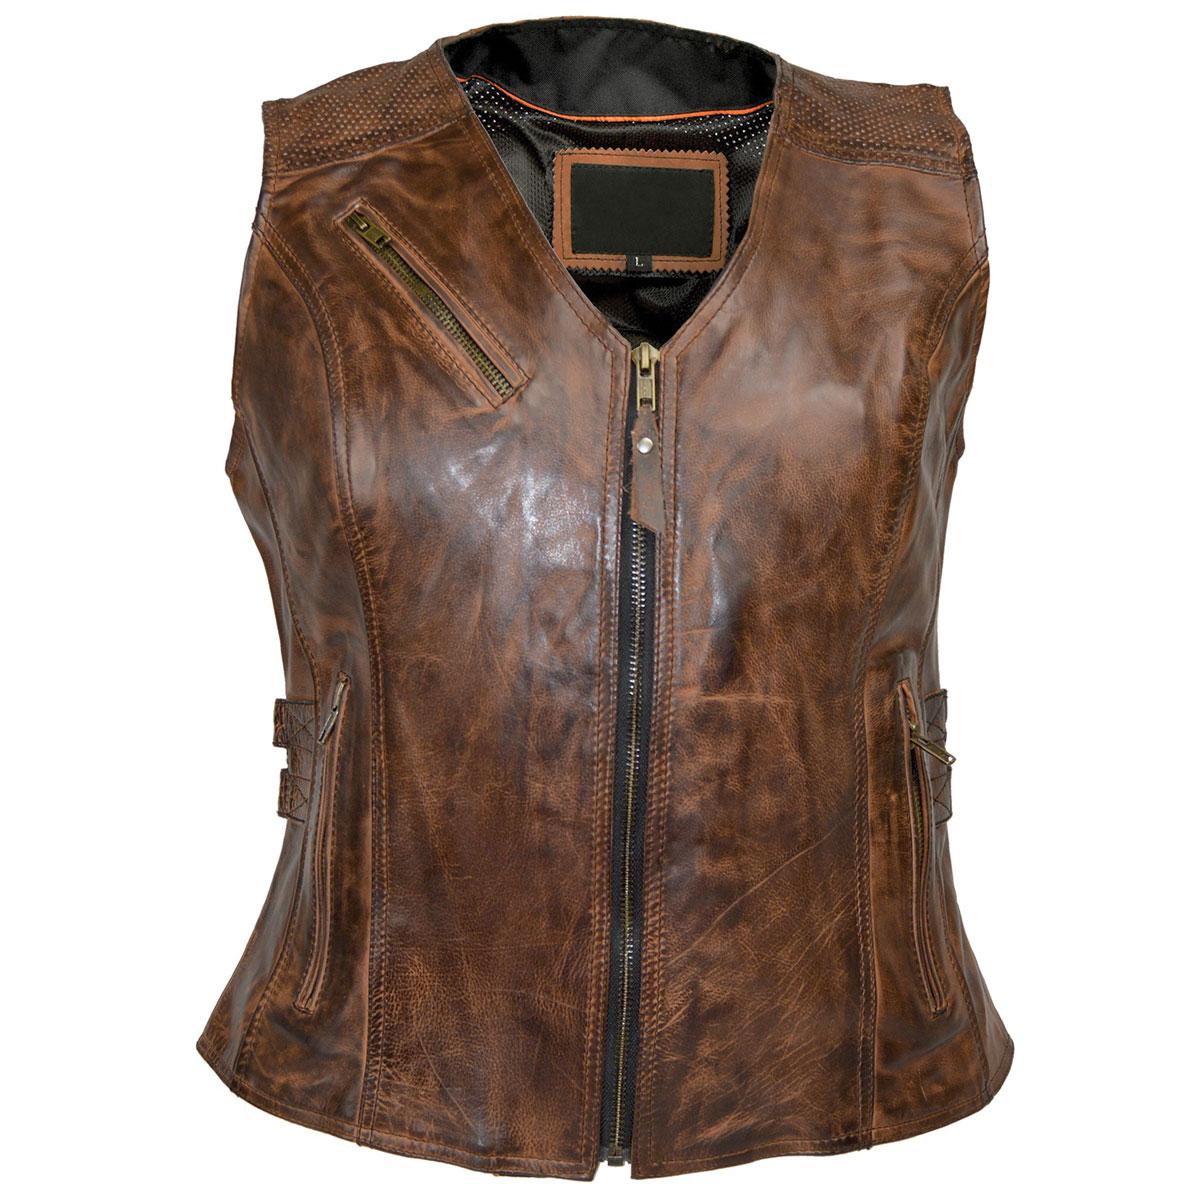 Vance Leathers Women's Buckled Vintage Brown Leather Vest